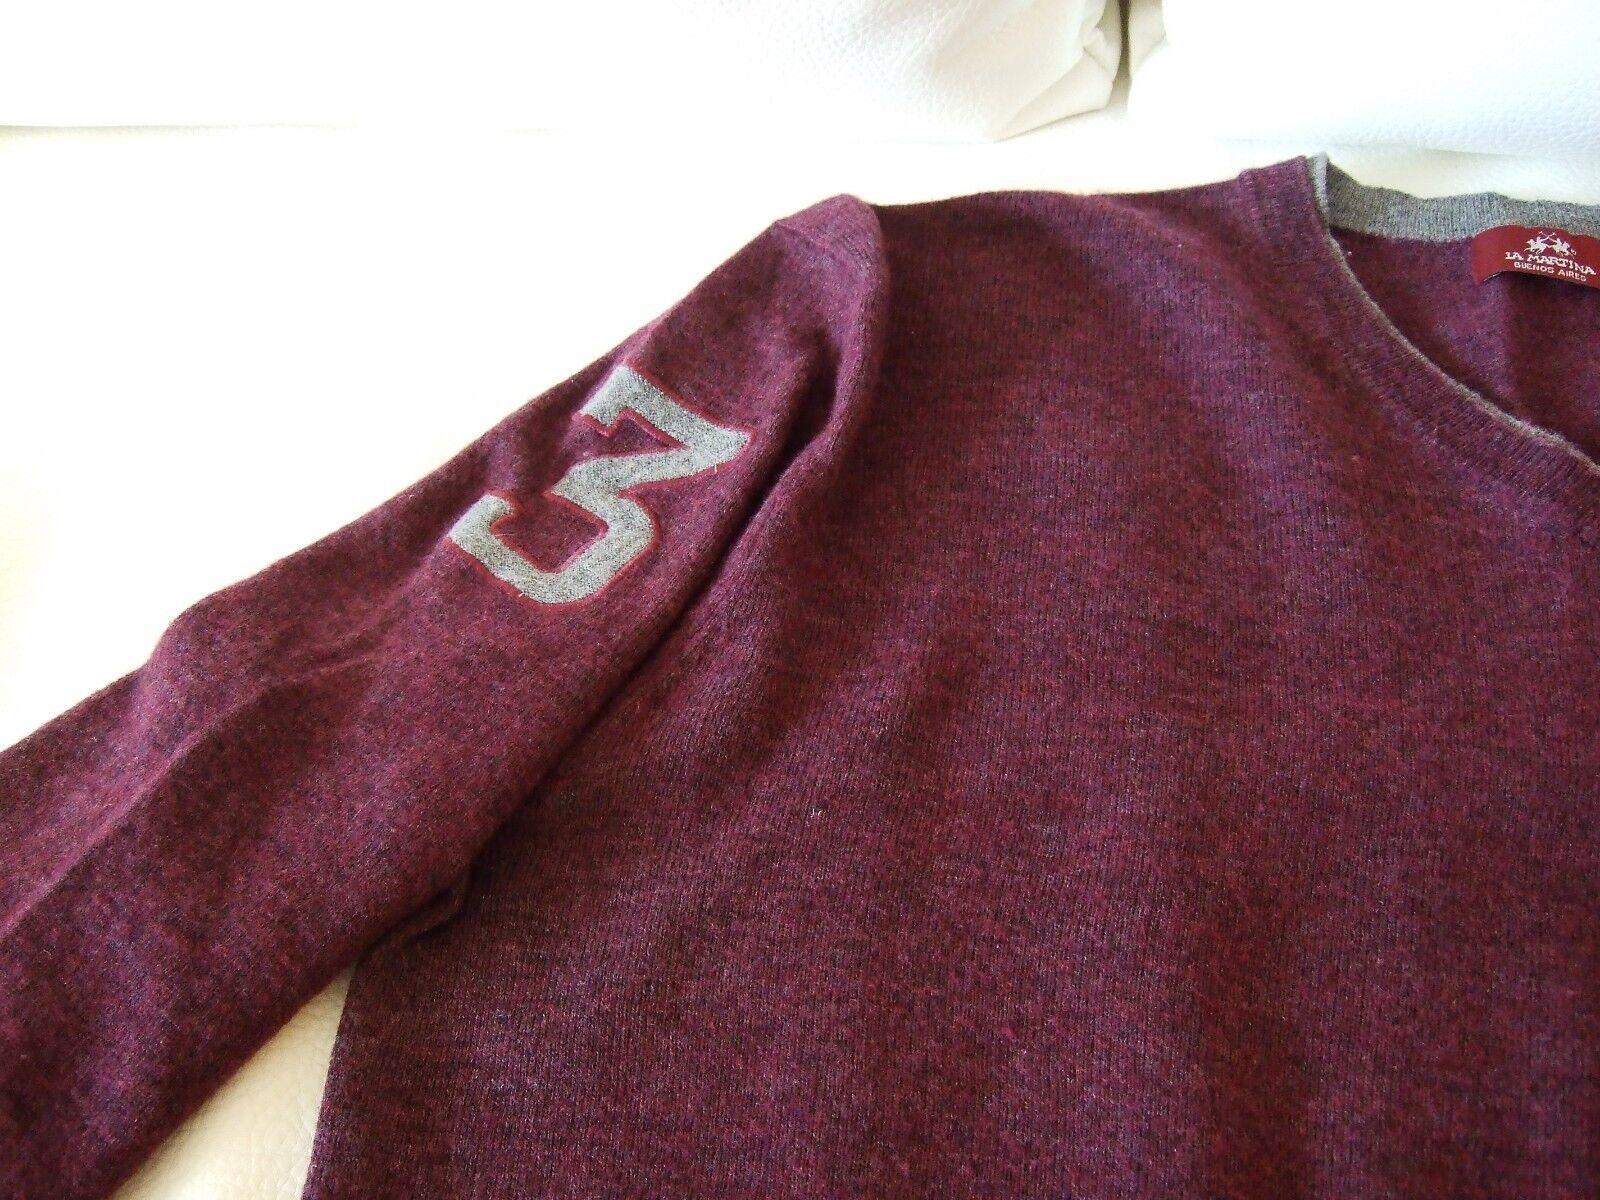 La Martina Herren Pullover Größe L Farbe Farbe Farbe Pflaume | Hat einen langen Ruf  1e06e7